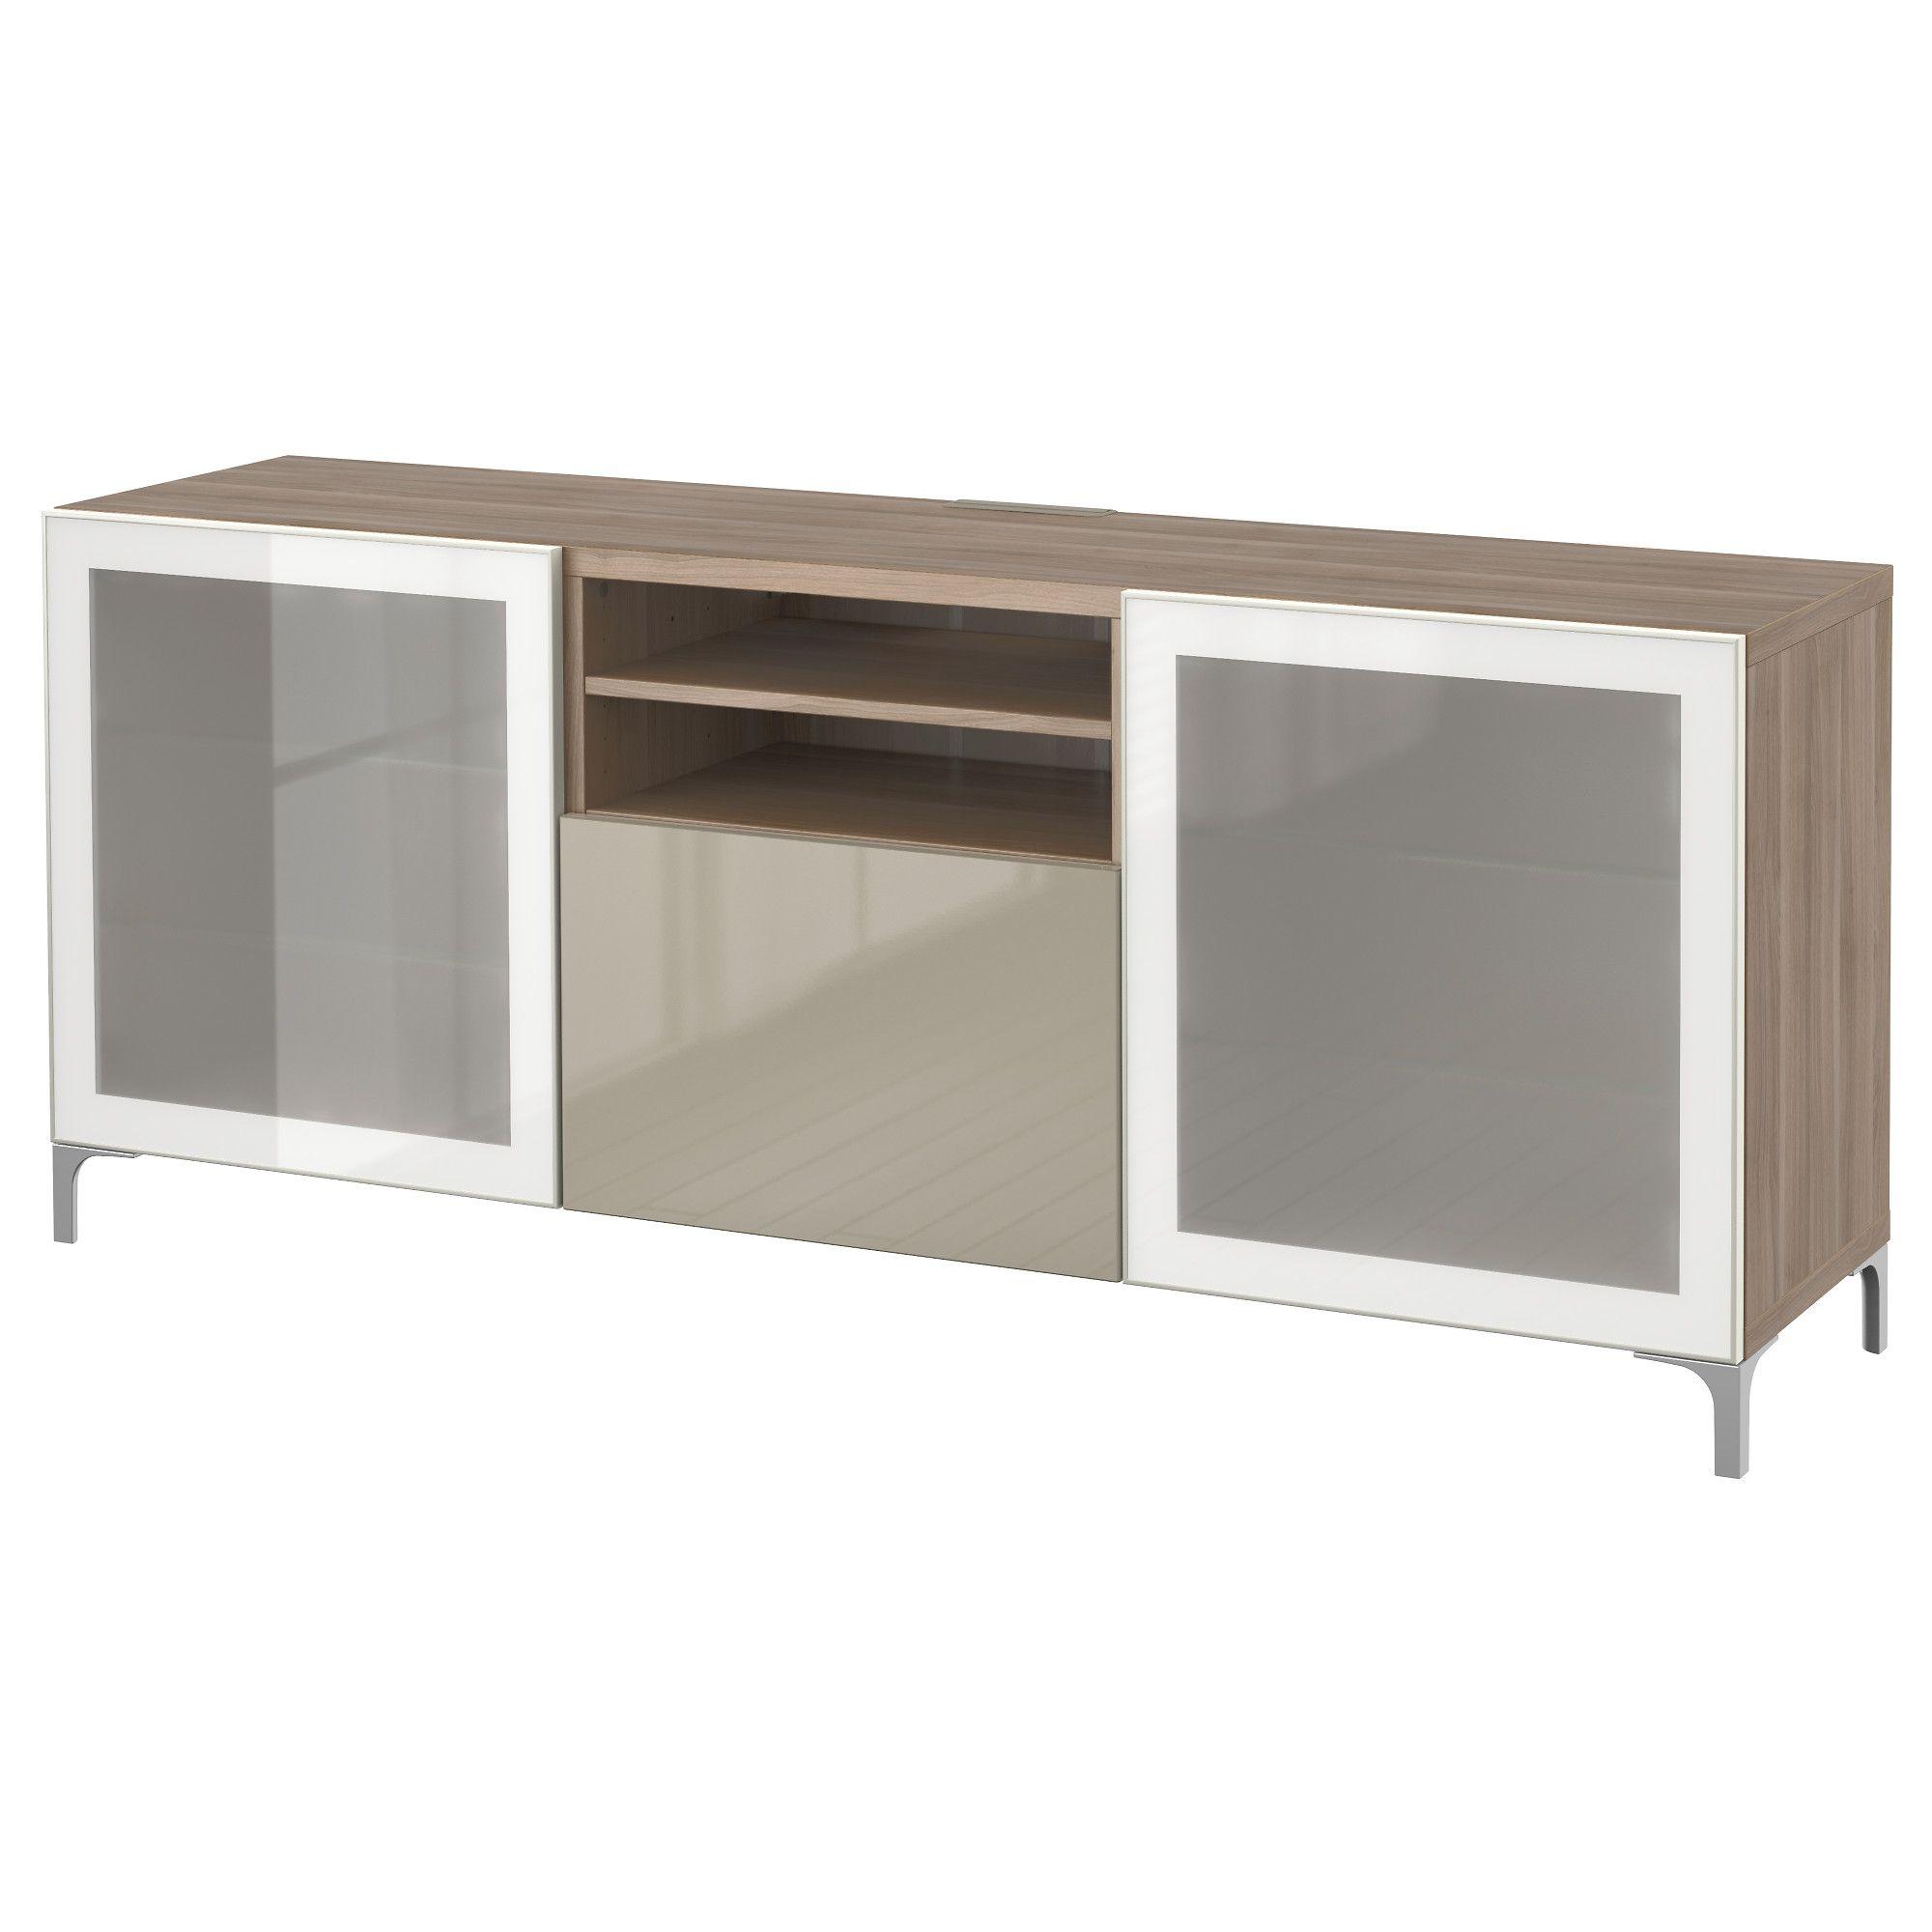 Ikea TV Unit With Push Open Drawers, Walnut Effect Light Gray, Selsviken  High Gloss/beige Clear Glass